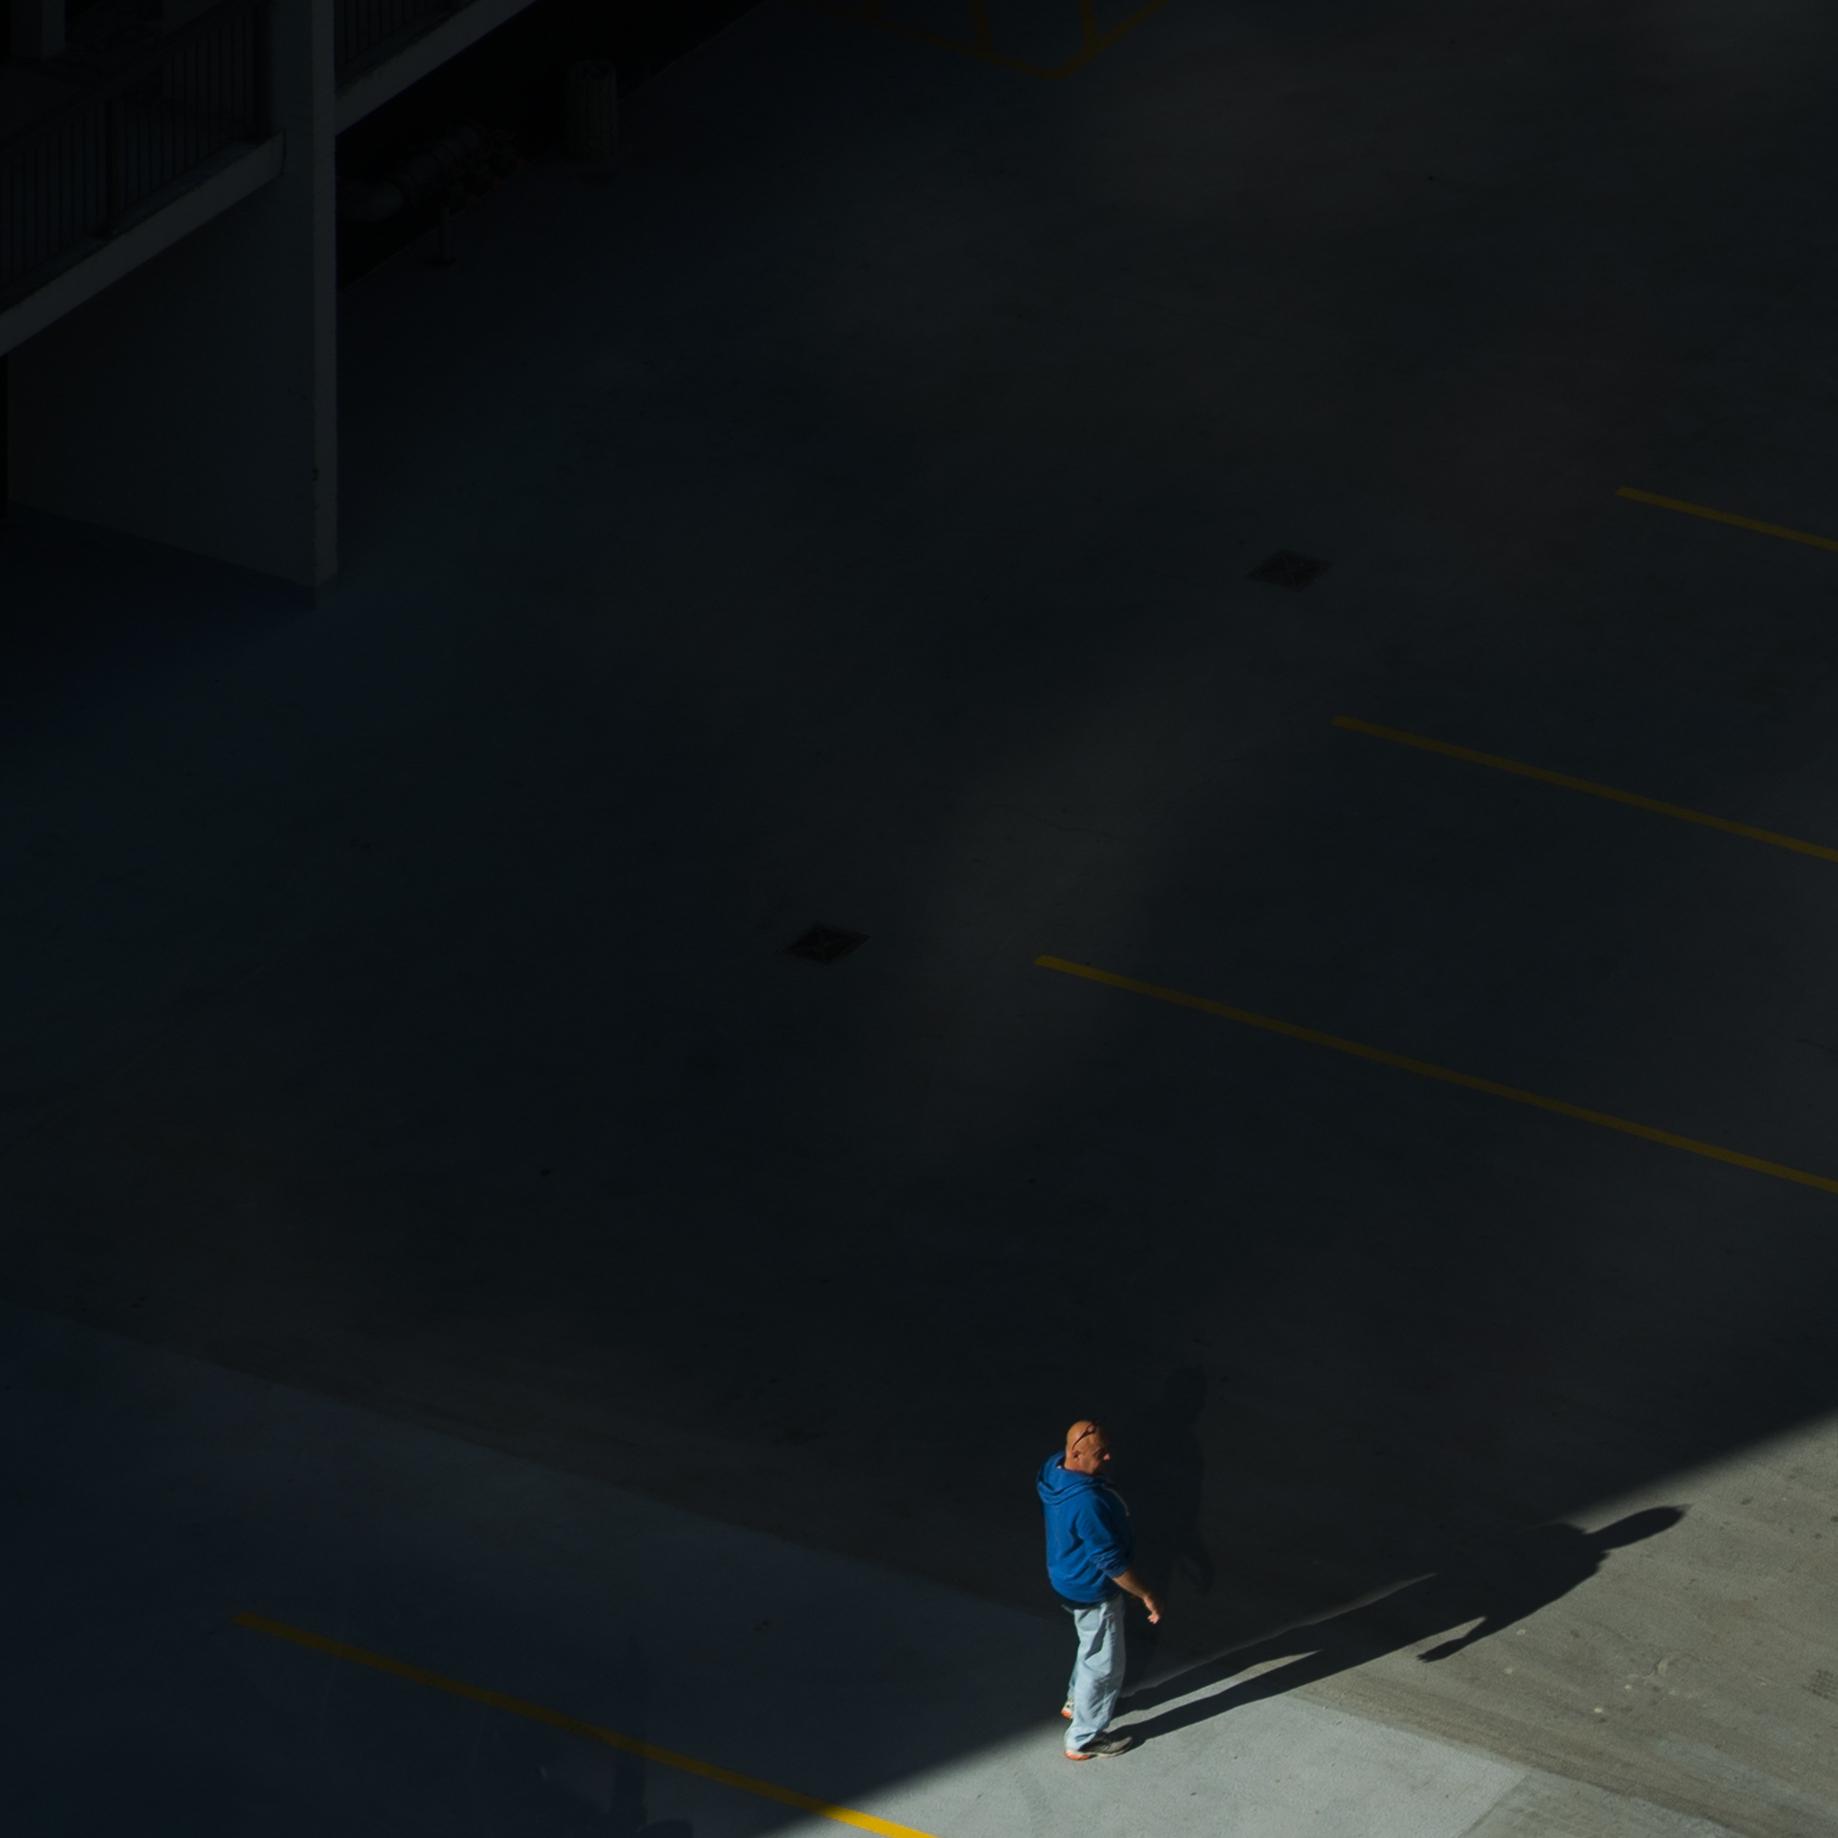 walkingman2.jpg